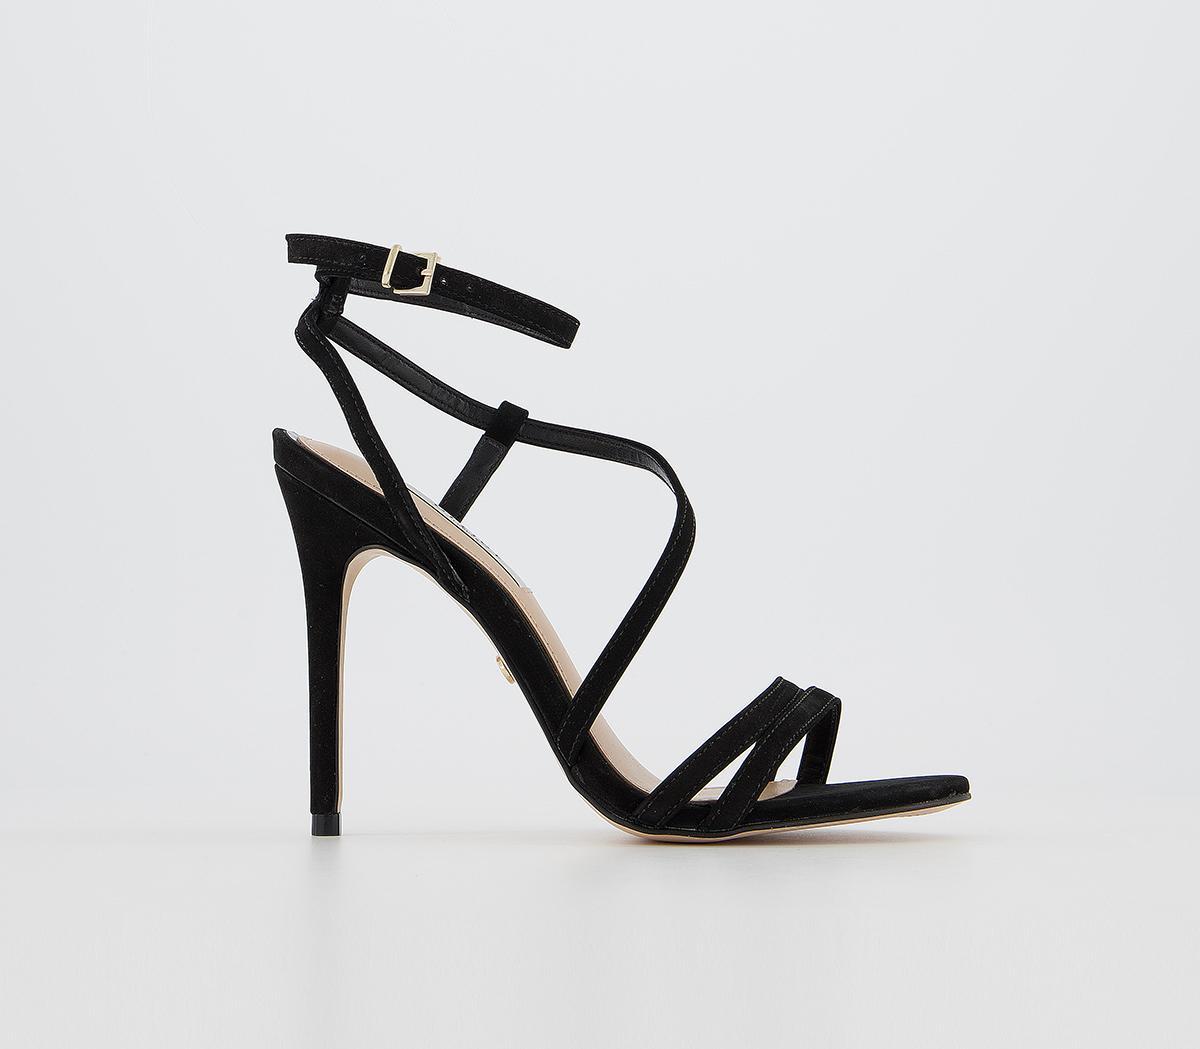 Office Headgirl Strappy High Sandals